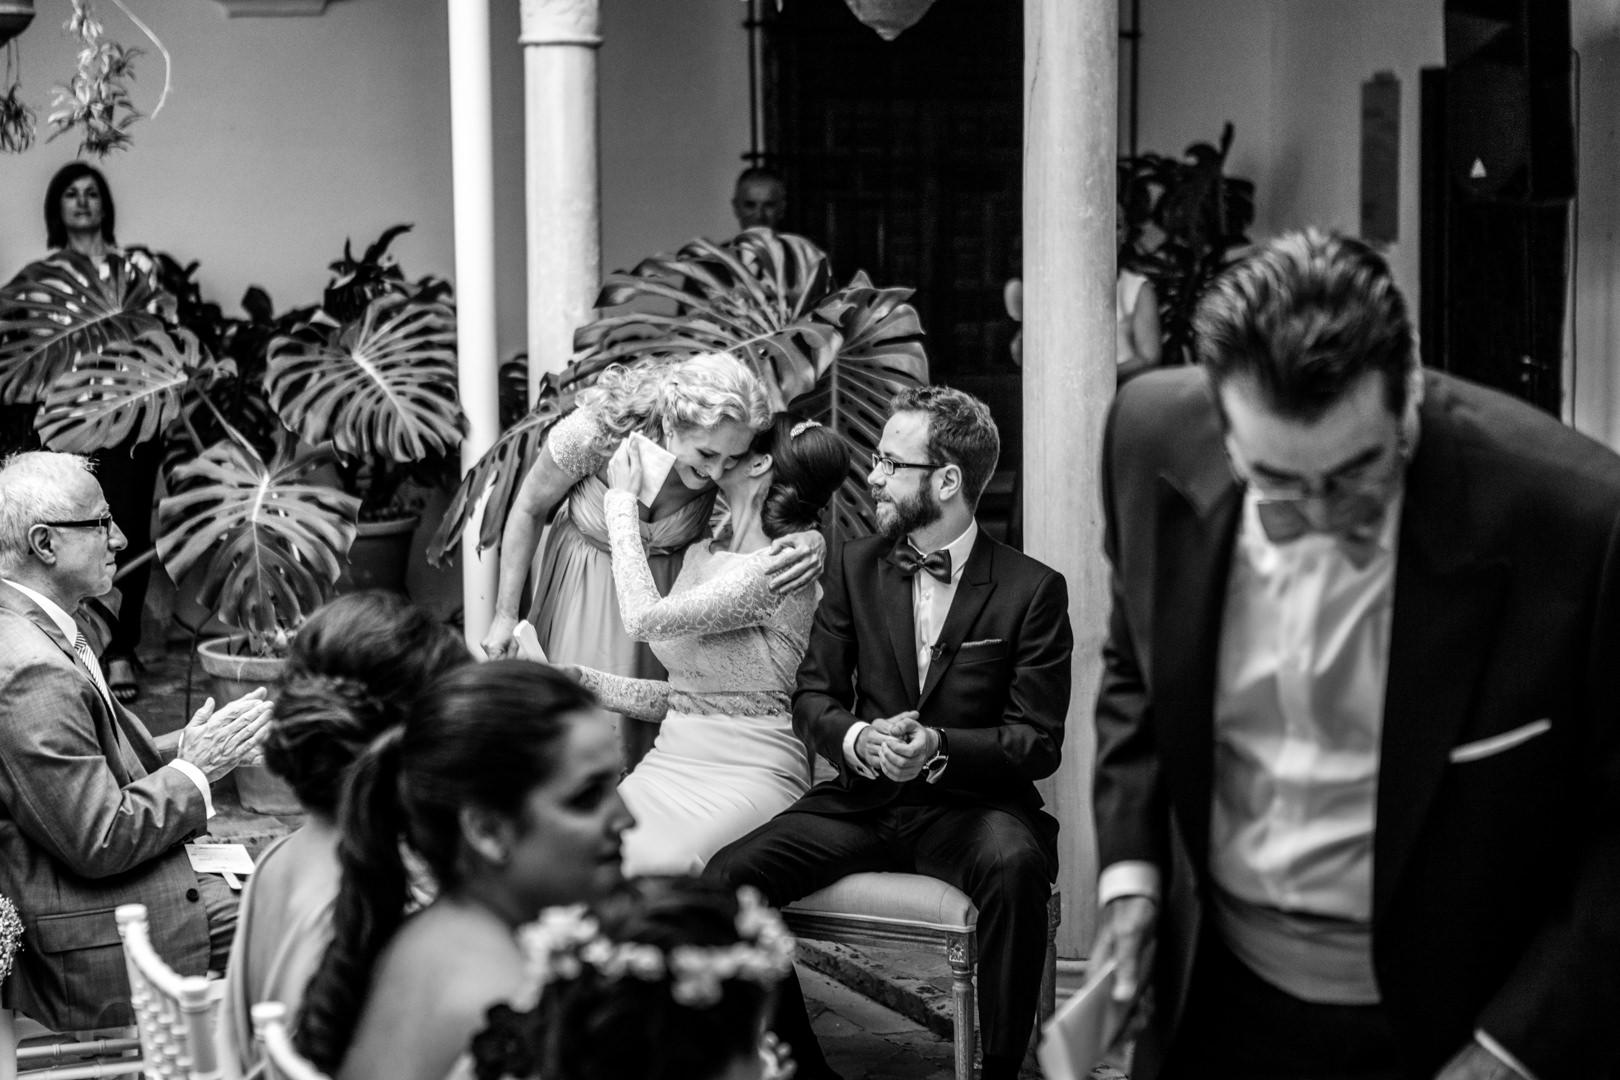 Boda-Sevilla-Museo-Carmona-Hamburgo-Maria-Carles-engagement-Rafael-Torres-fotografo-bodas-sevilla-madrid-barcelona-wedding-photographer--20.jpg